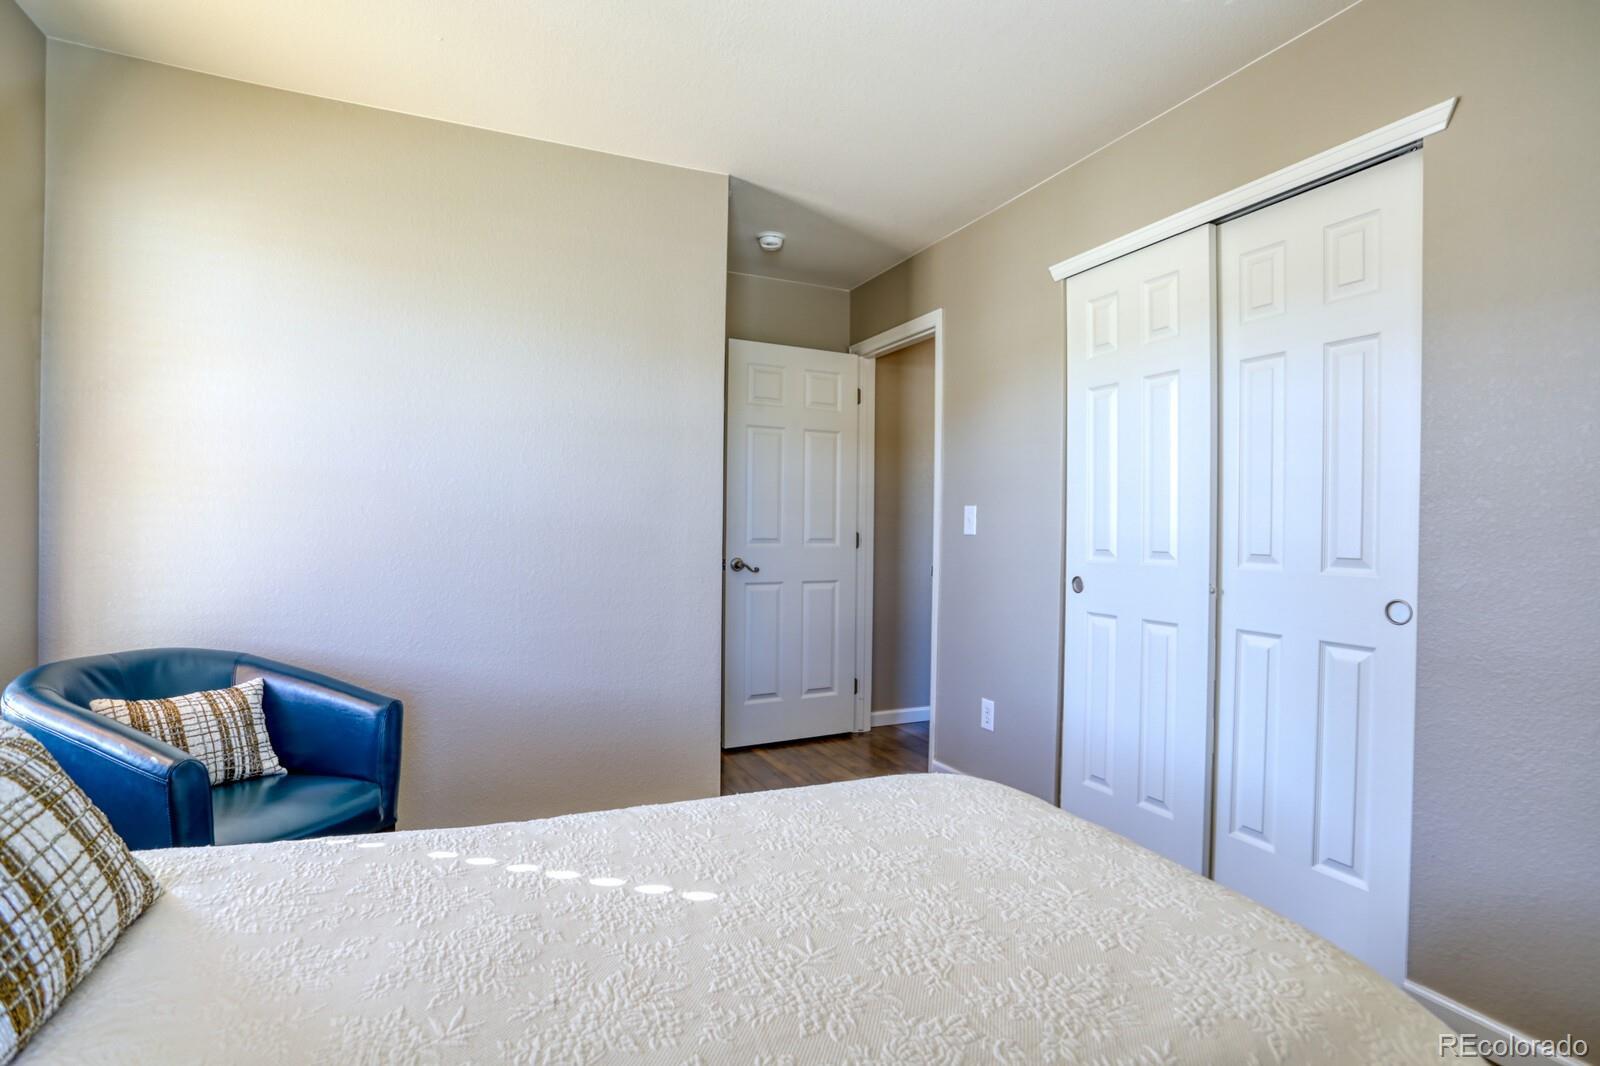 MLS# 8551789 - 24 - 22752 E Briarwood Place, Aurora, CO 80016